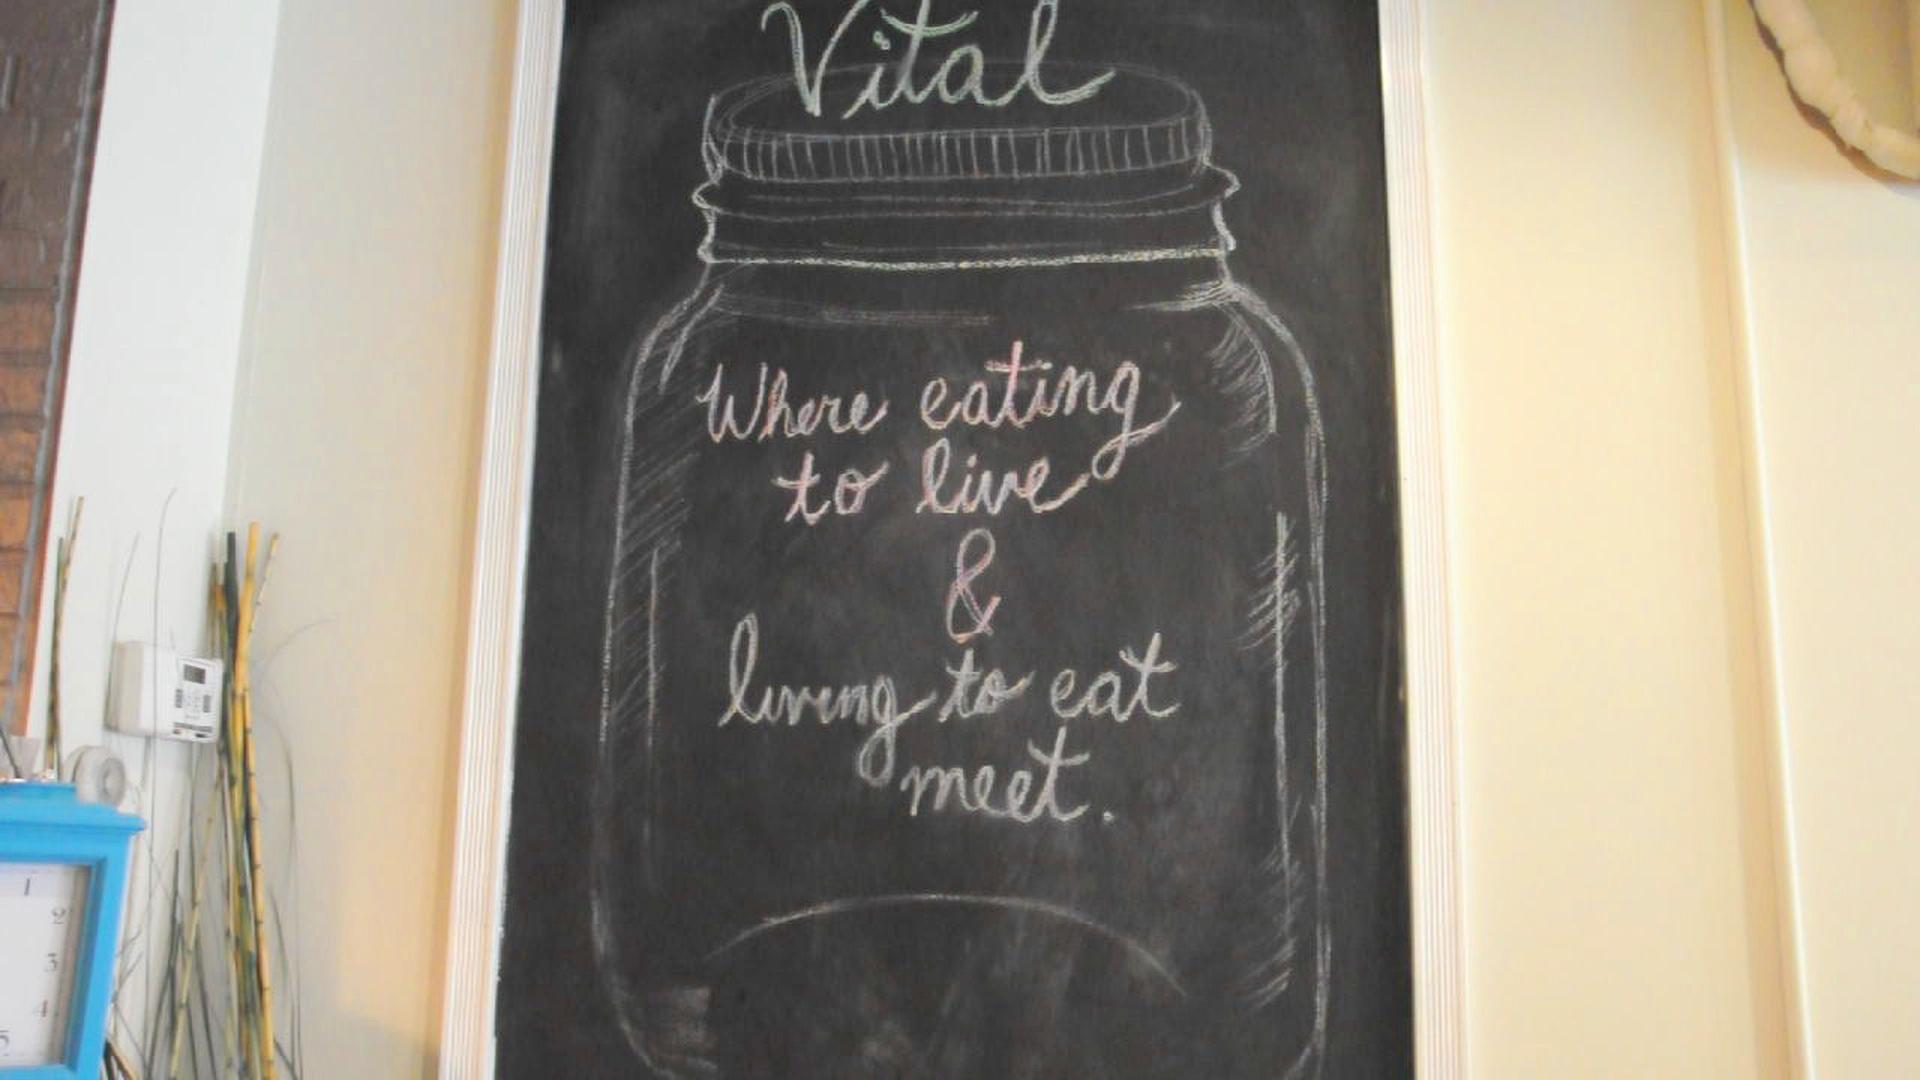 """Vital:Where eating to live & living to eat meet."""